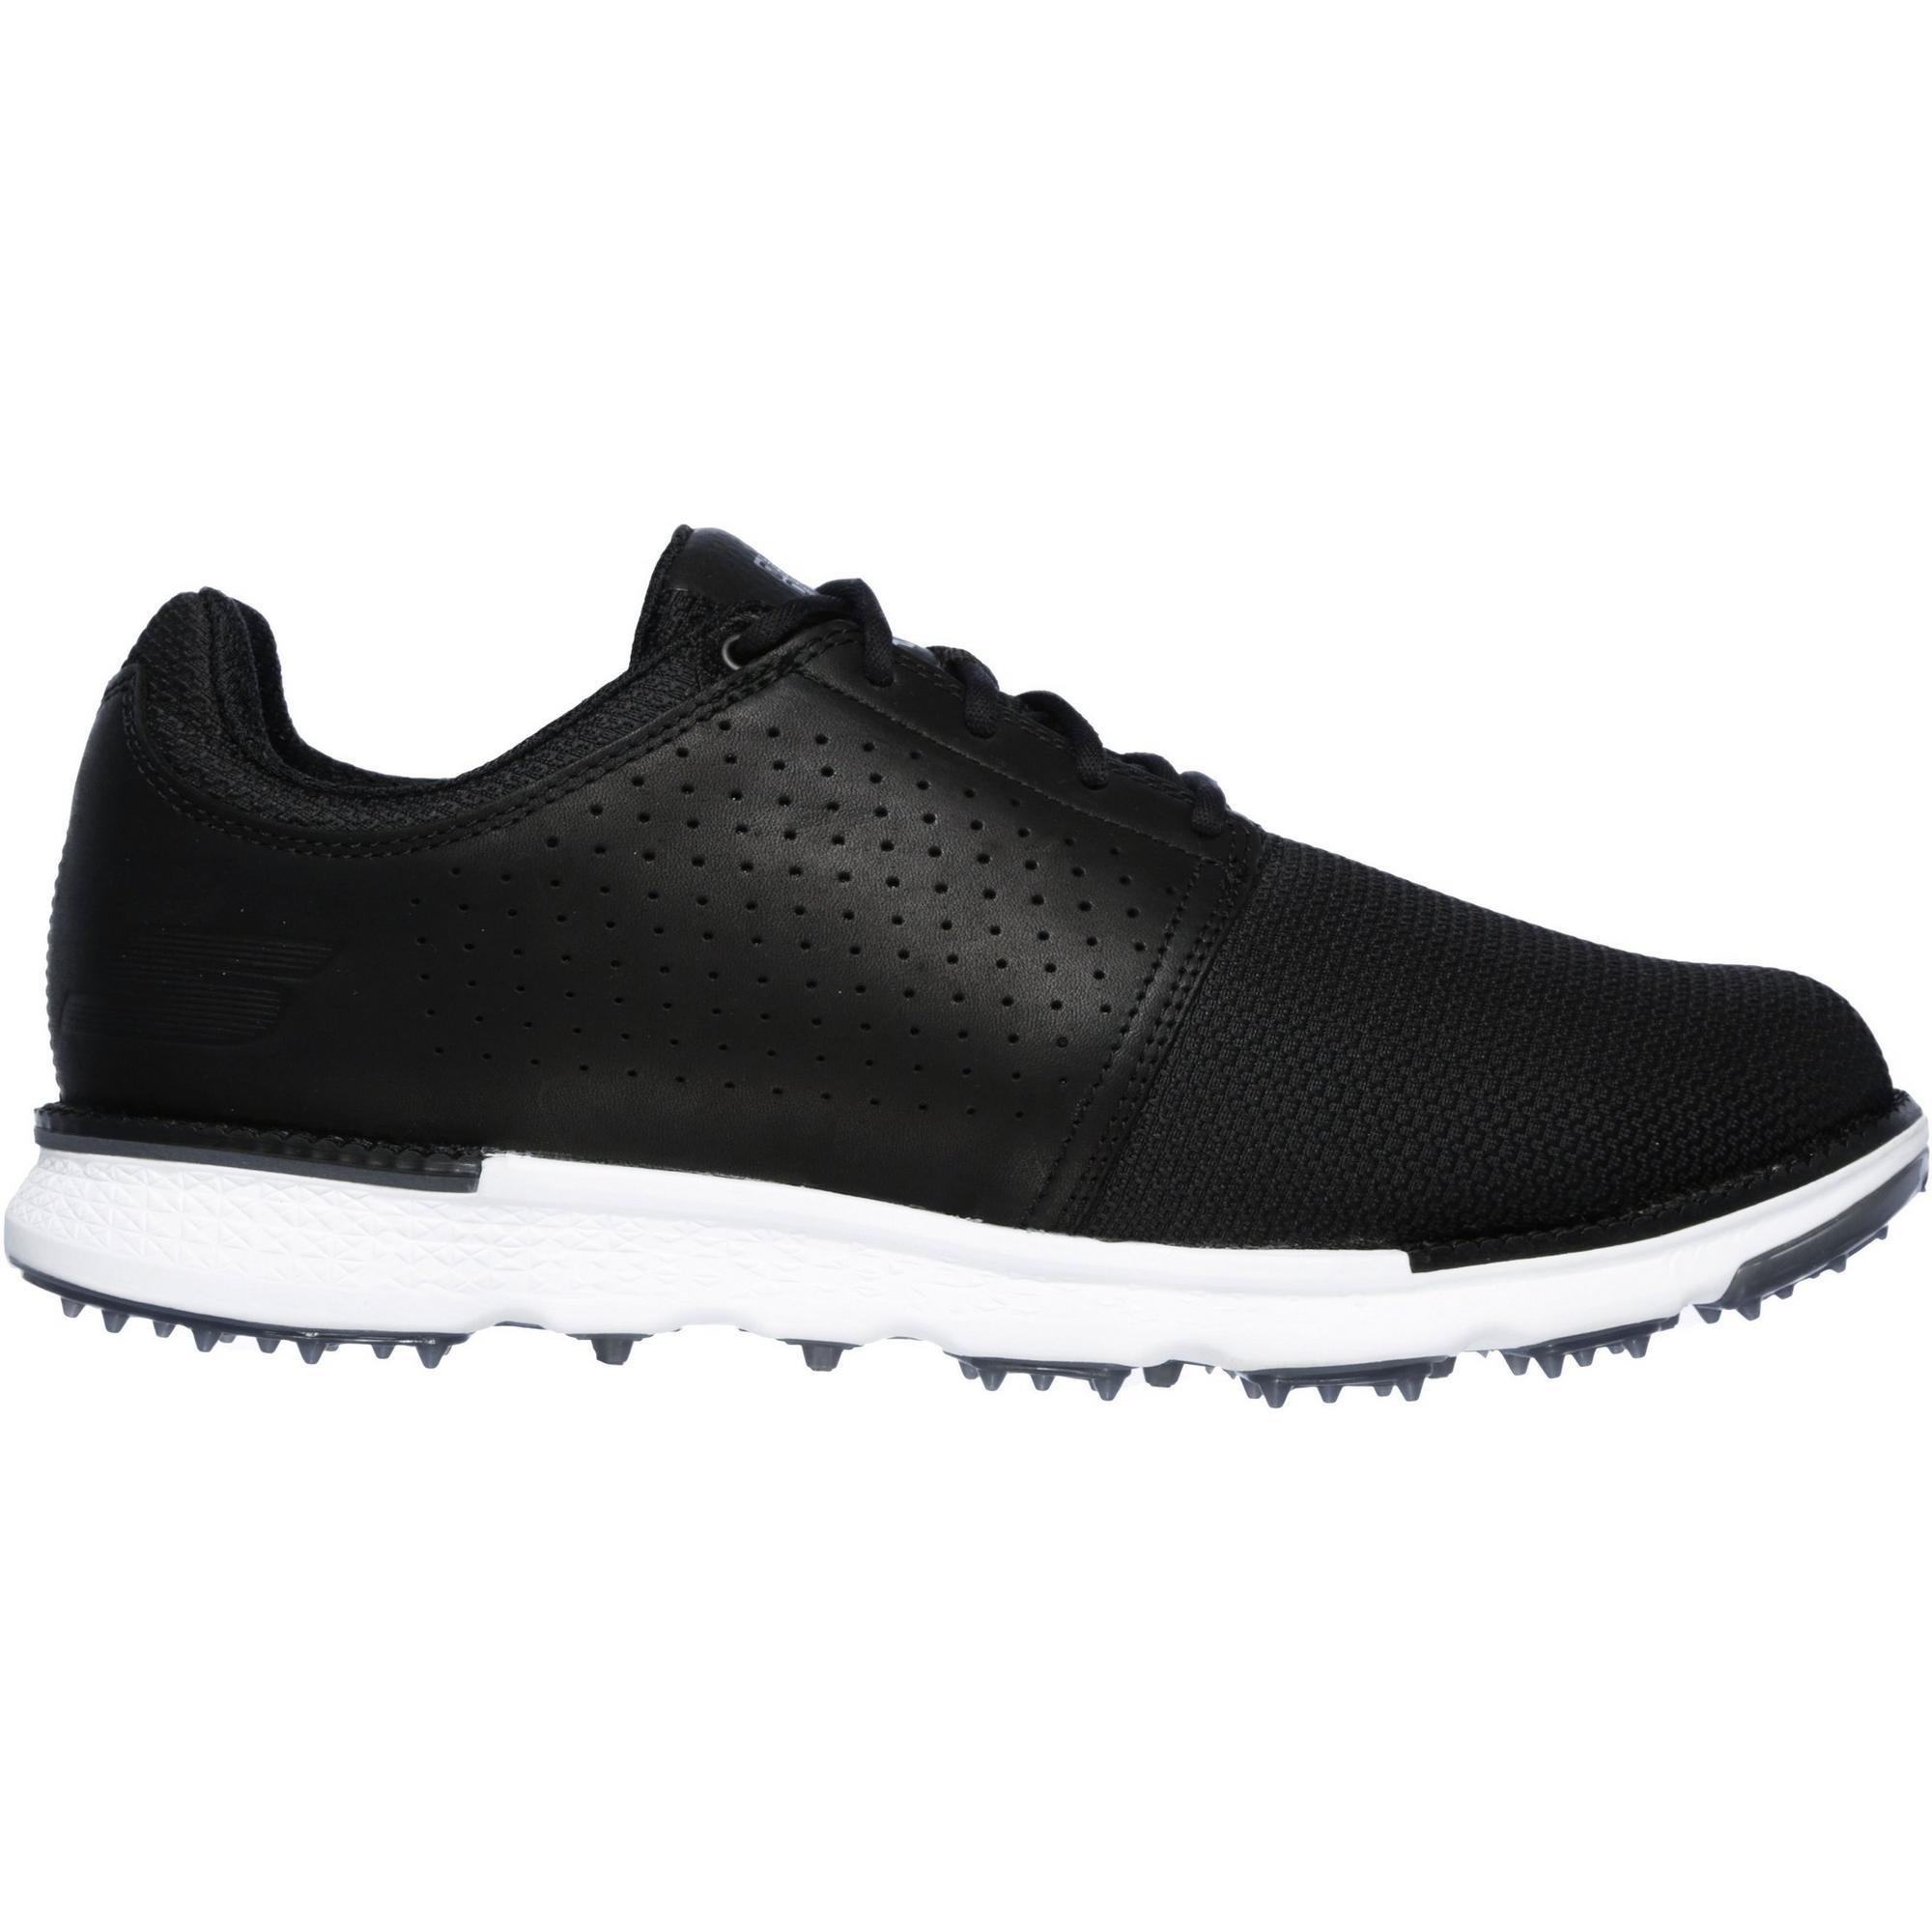 Men's Go Golf Elite V.3 Approach Relaxed Fit Spikeless Golf  Shoe - BLK